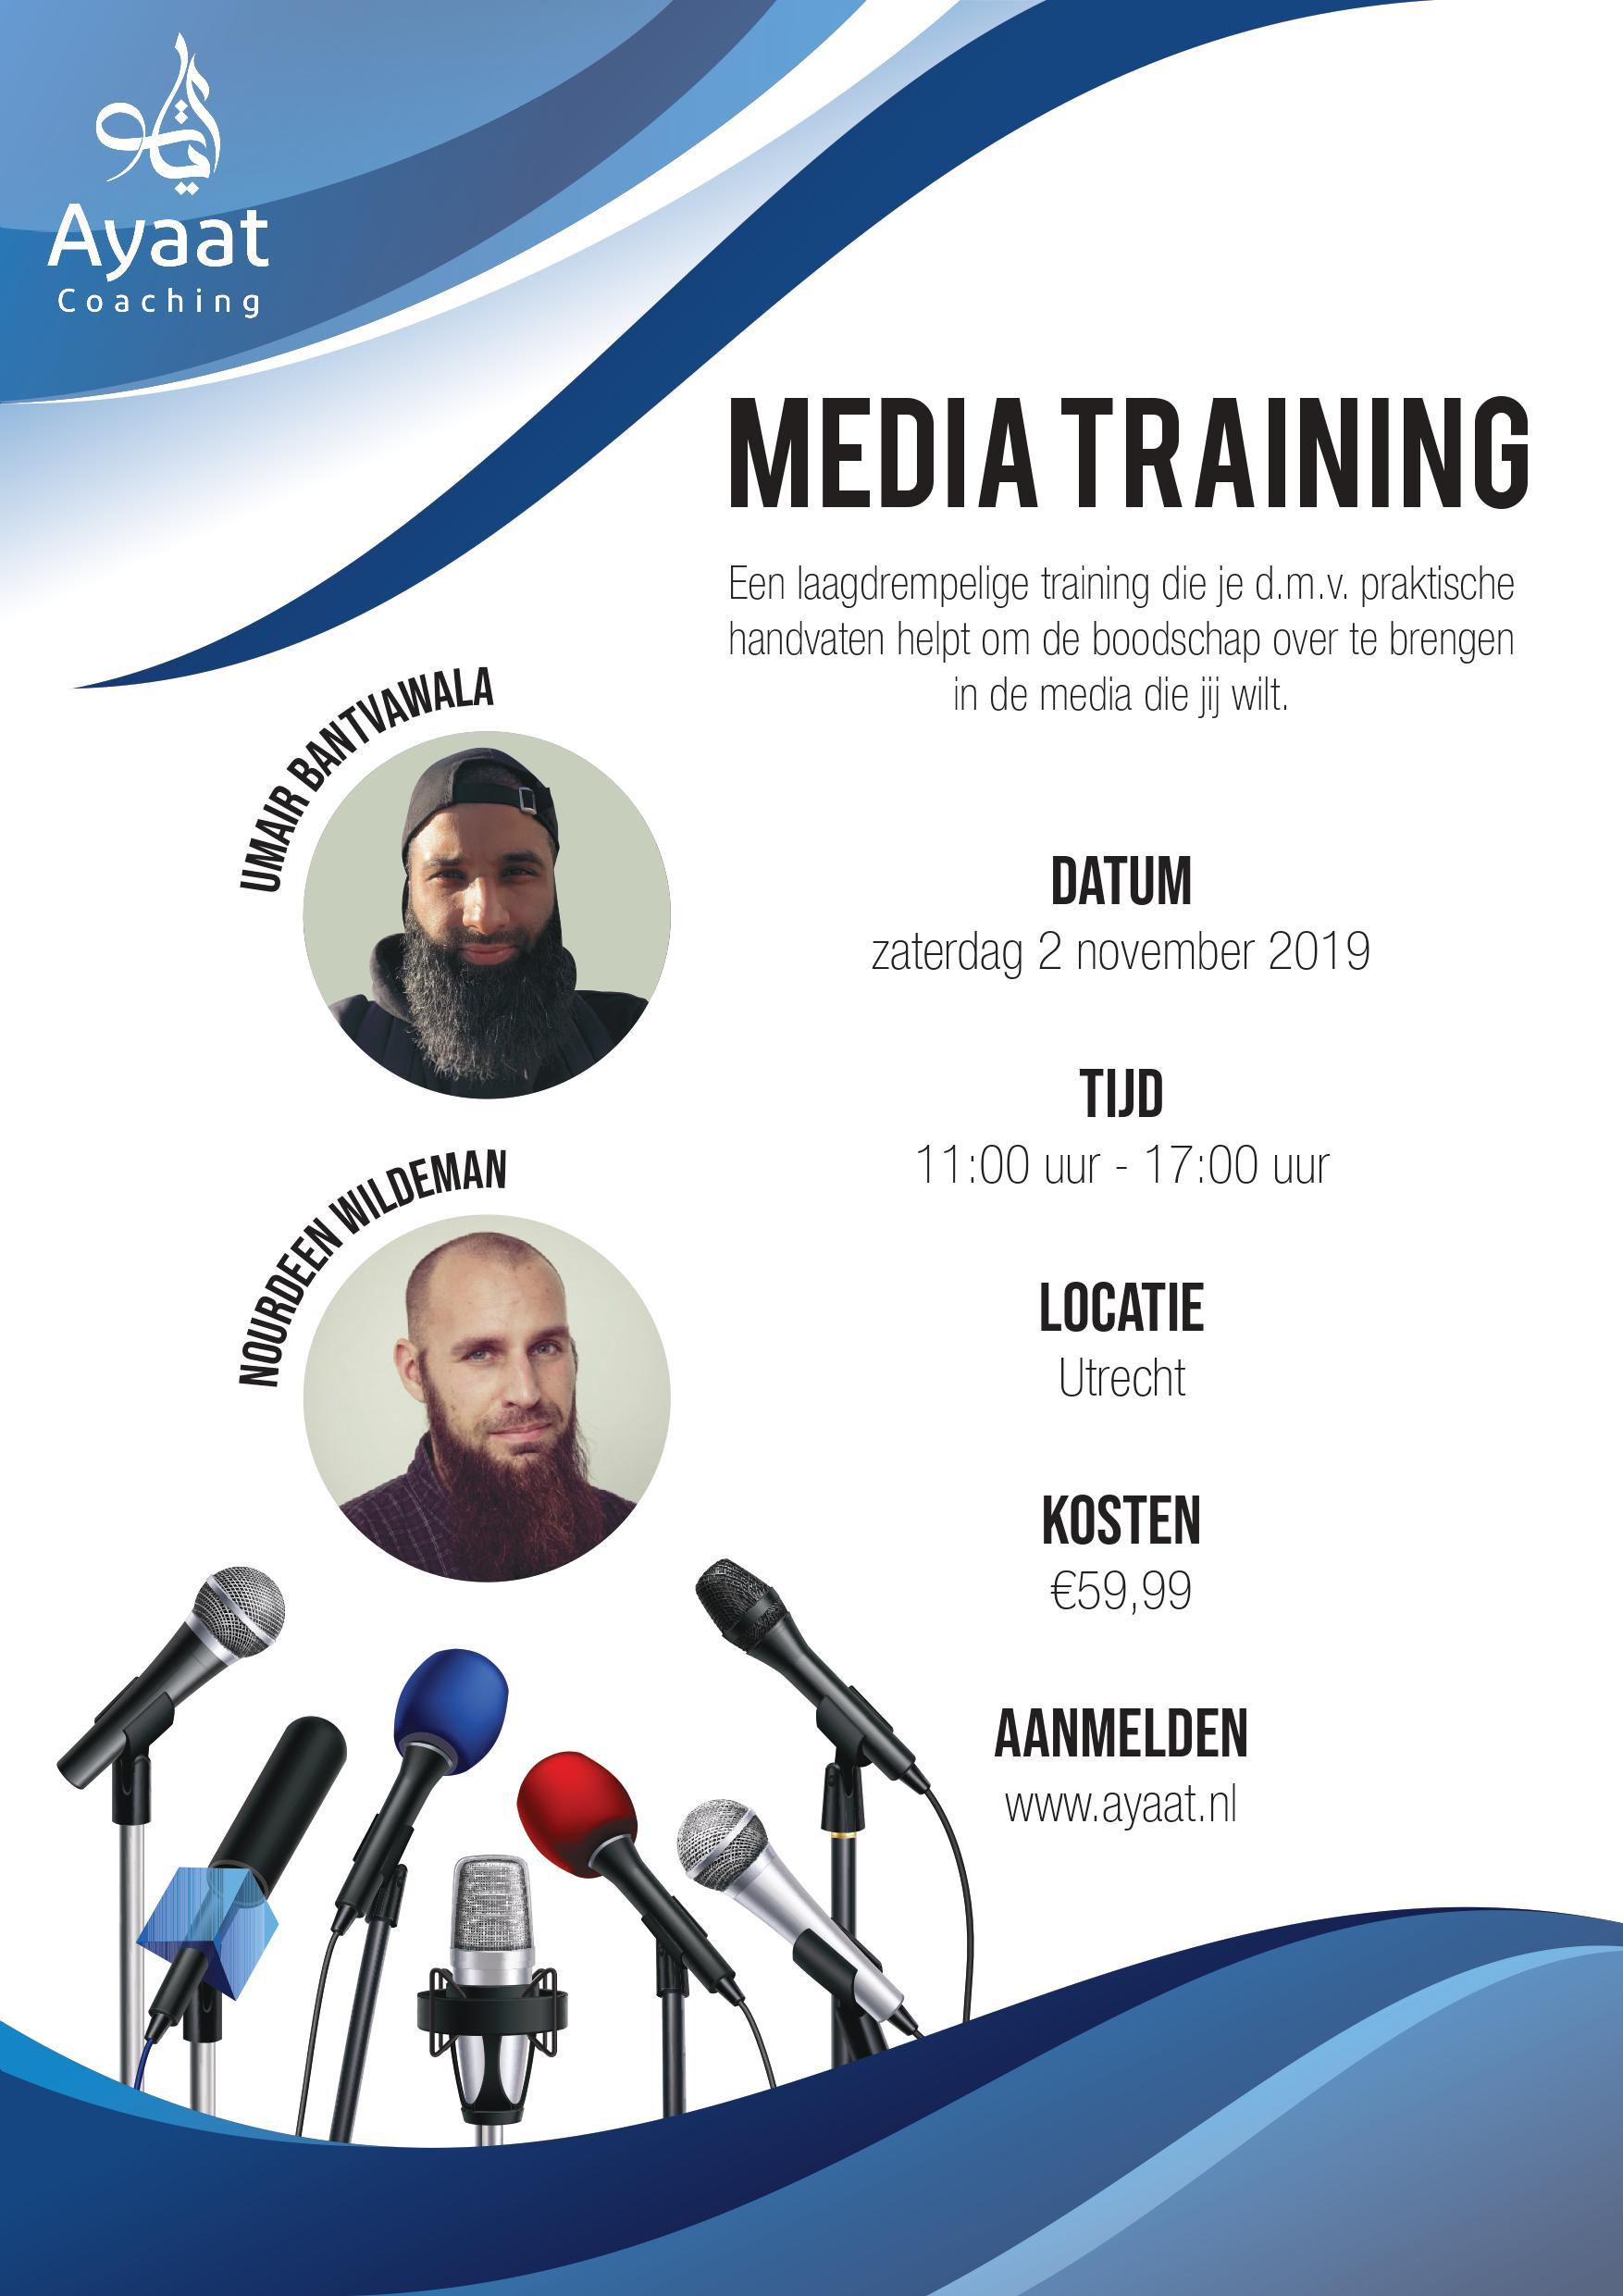 ayaat-coaching-mediatraining